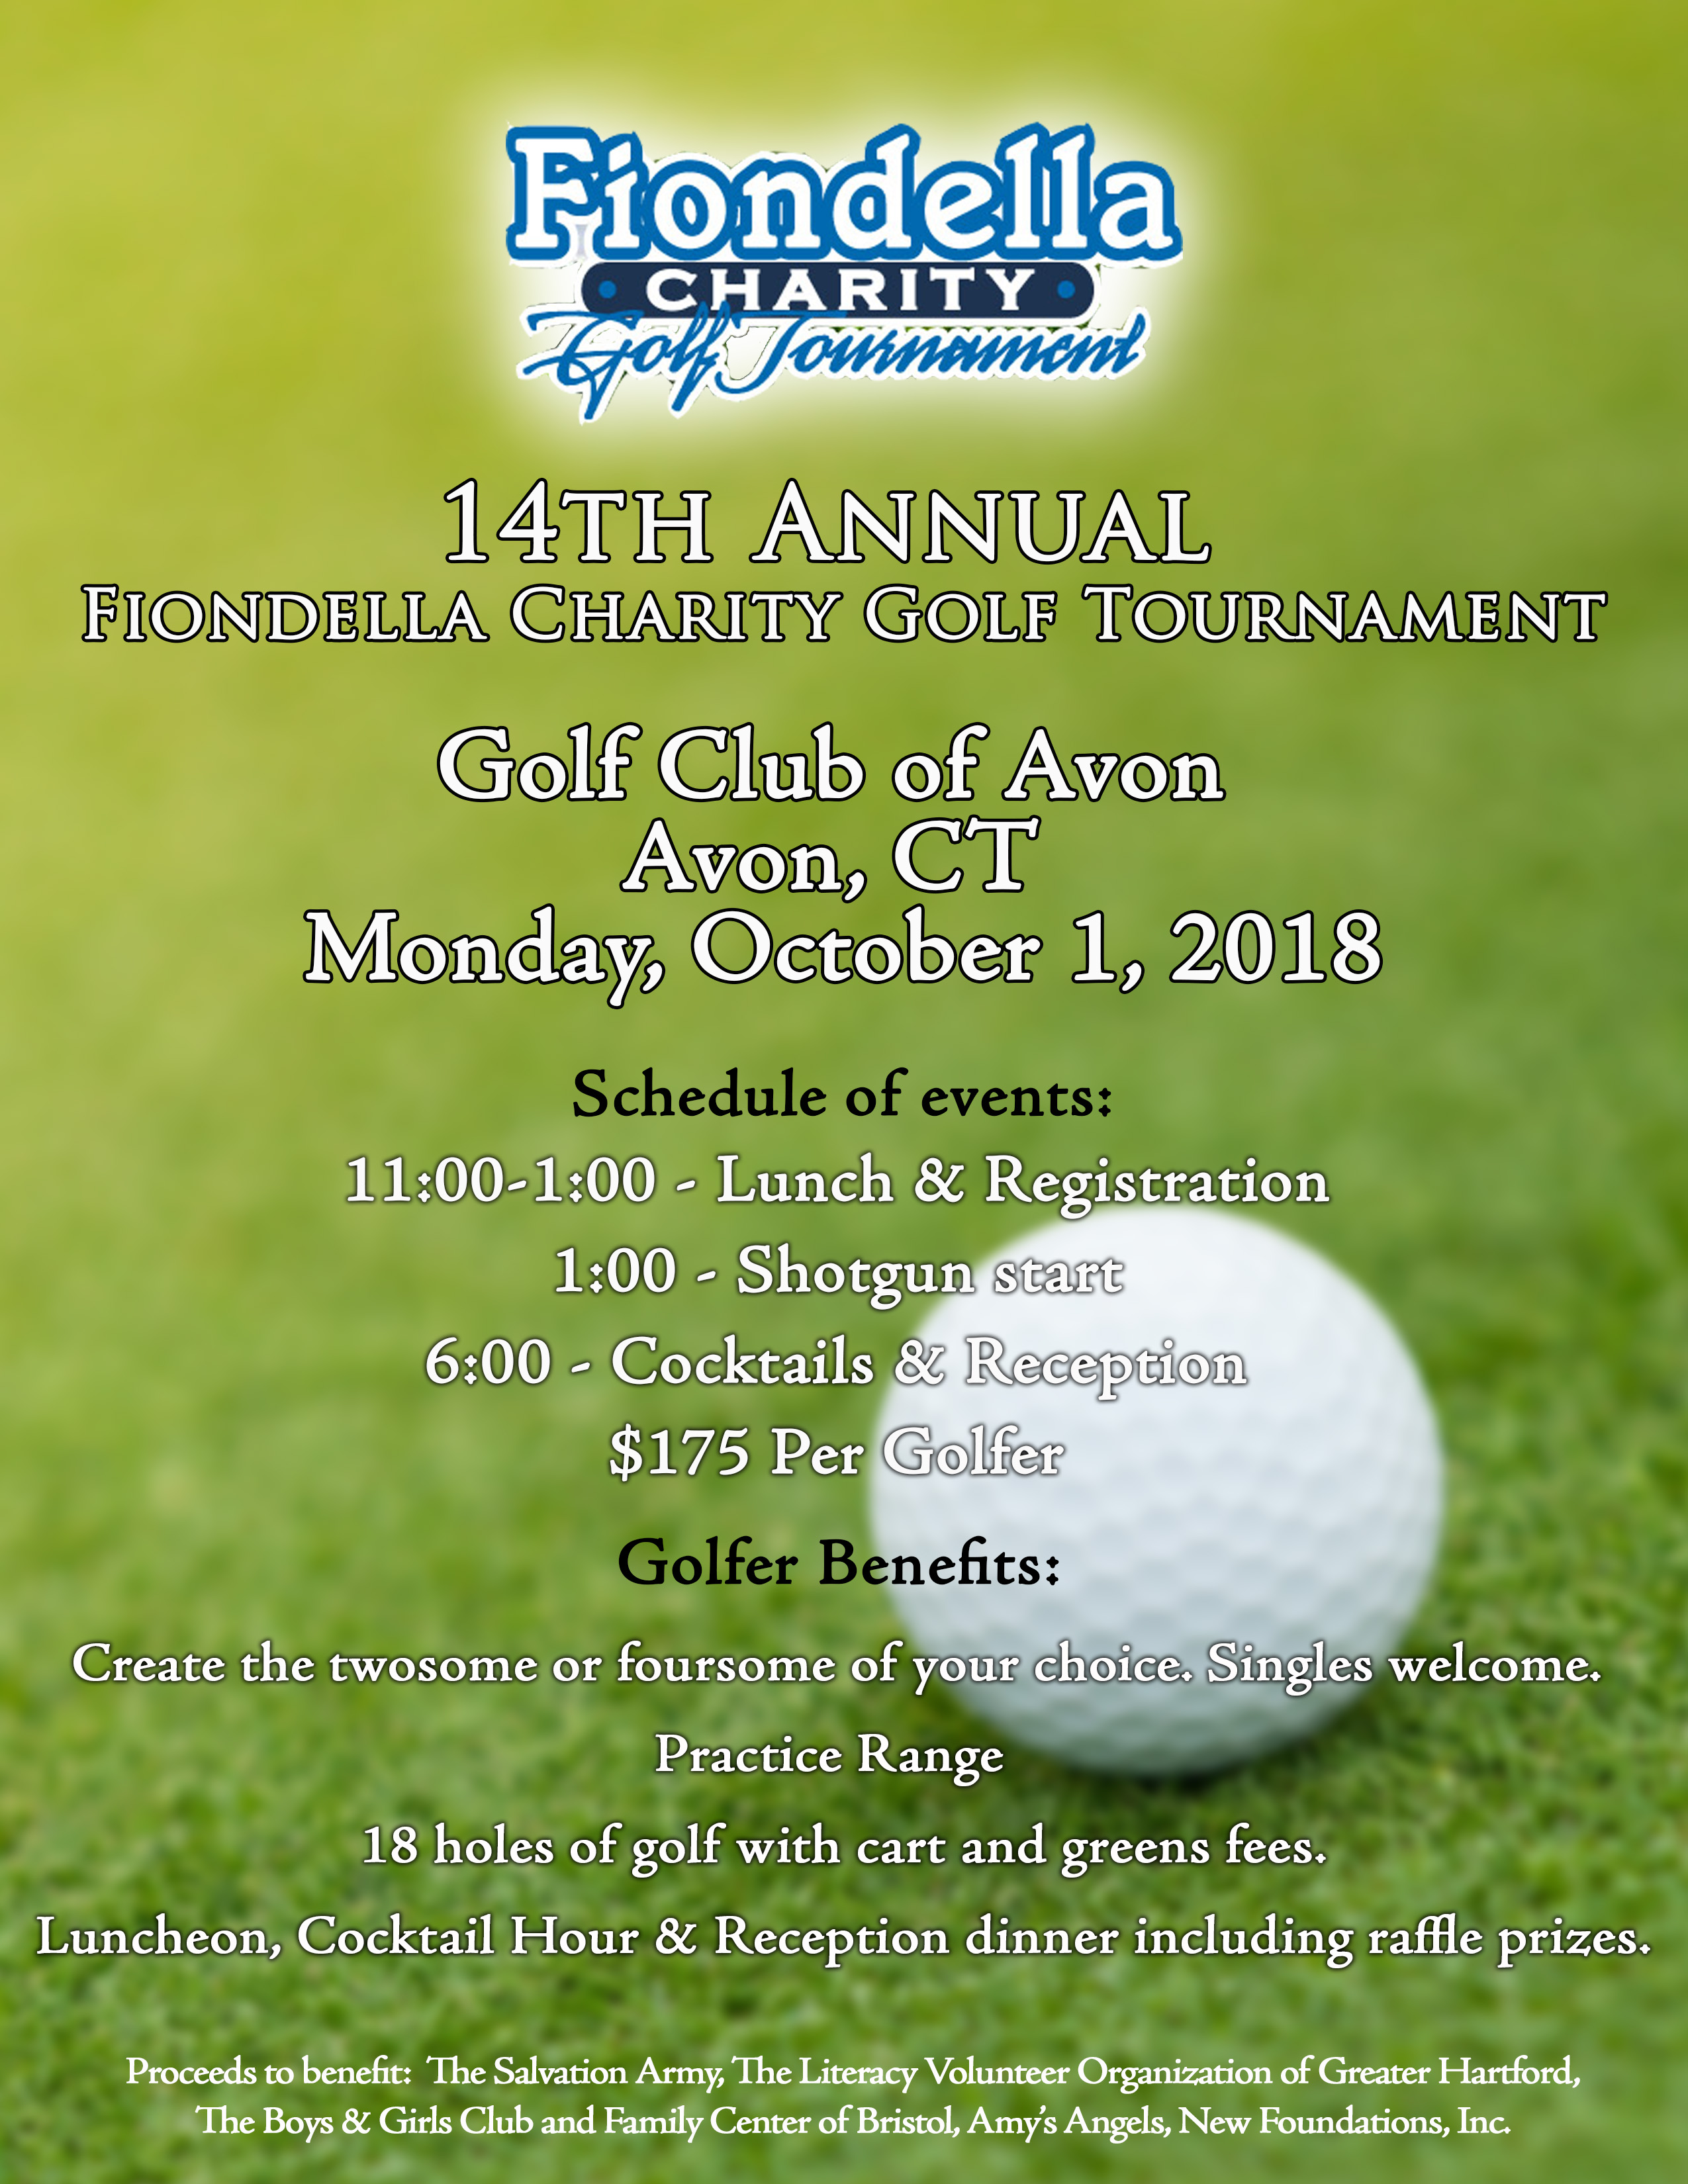 Fiondella Golf Tournament